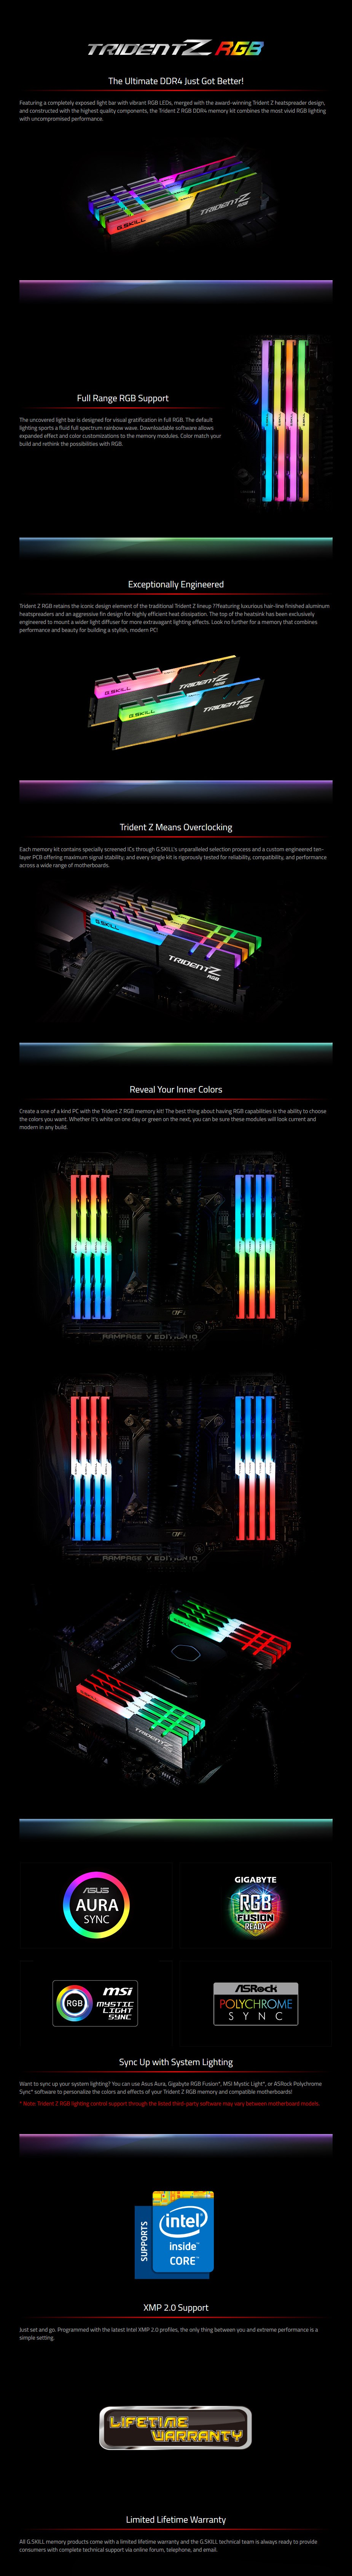 G.Skill Trident Z RGB 32GB (4x 8GB) DDR4 4000MHz Memory - Overview 1